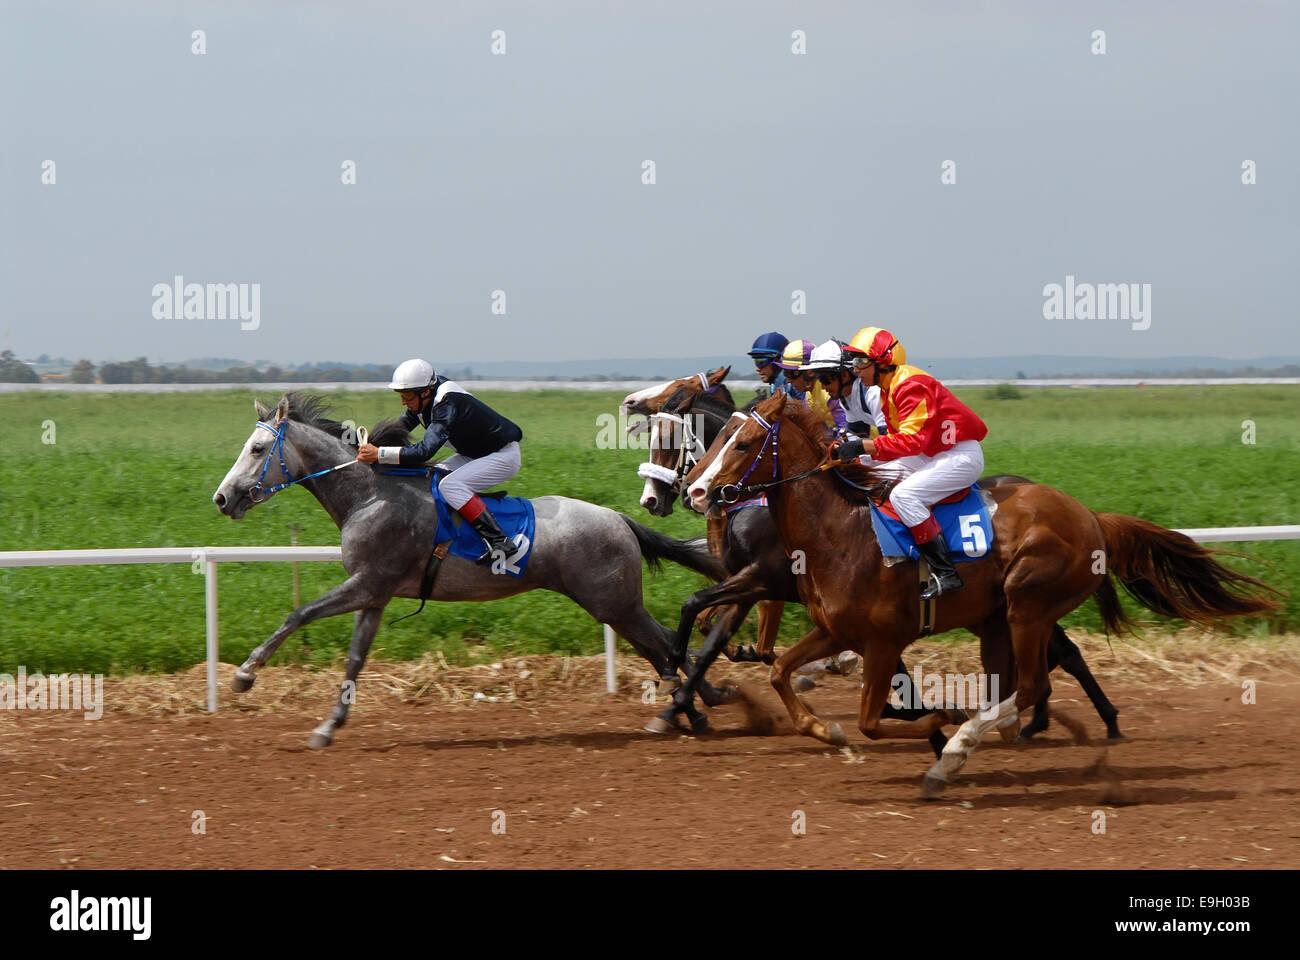 Horse race, Israel - Stock Image